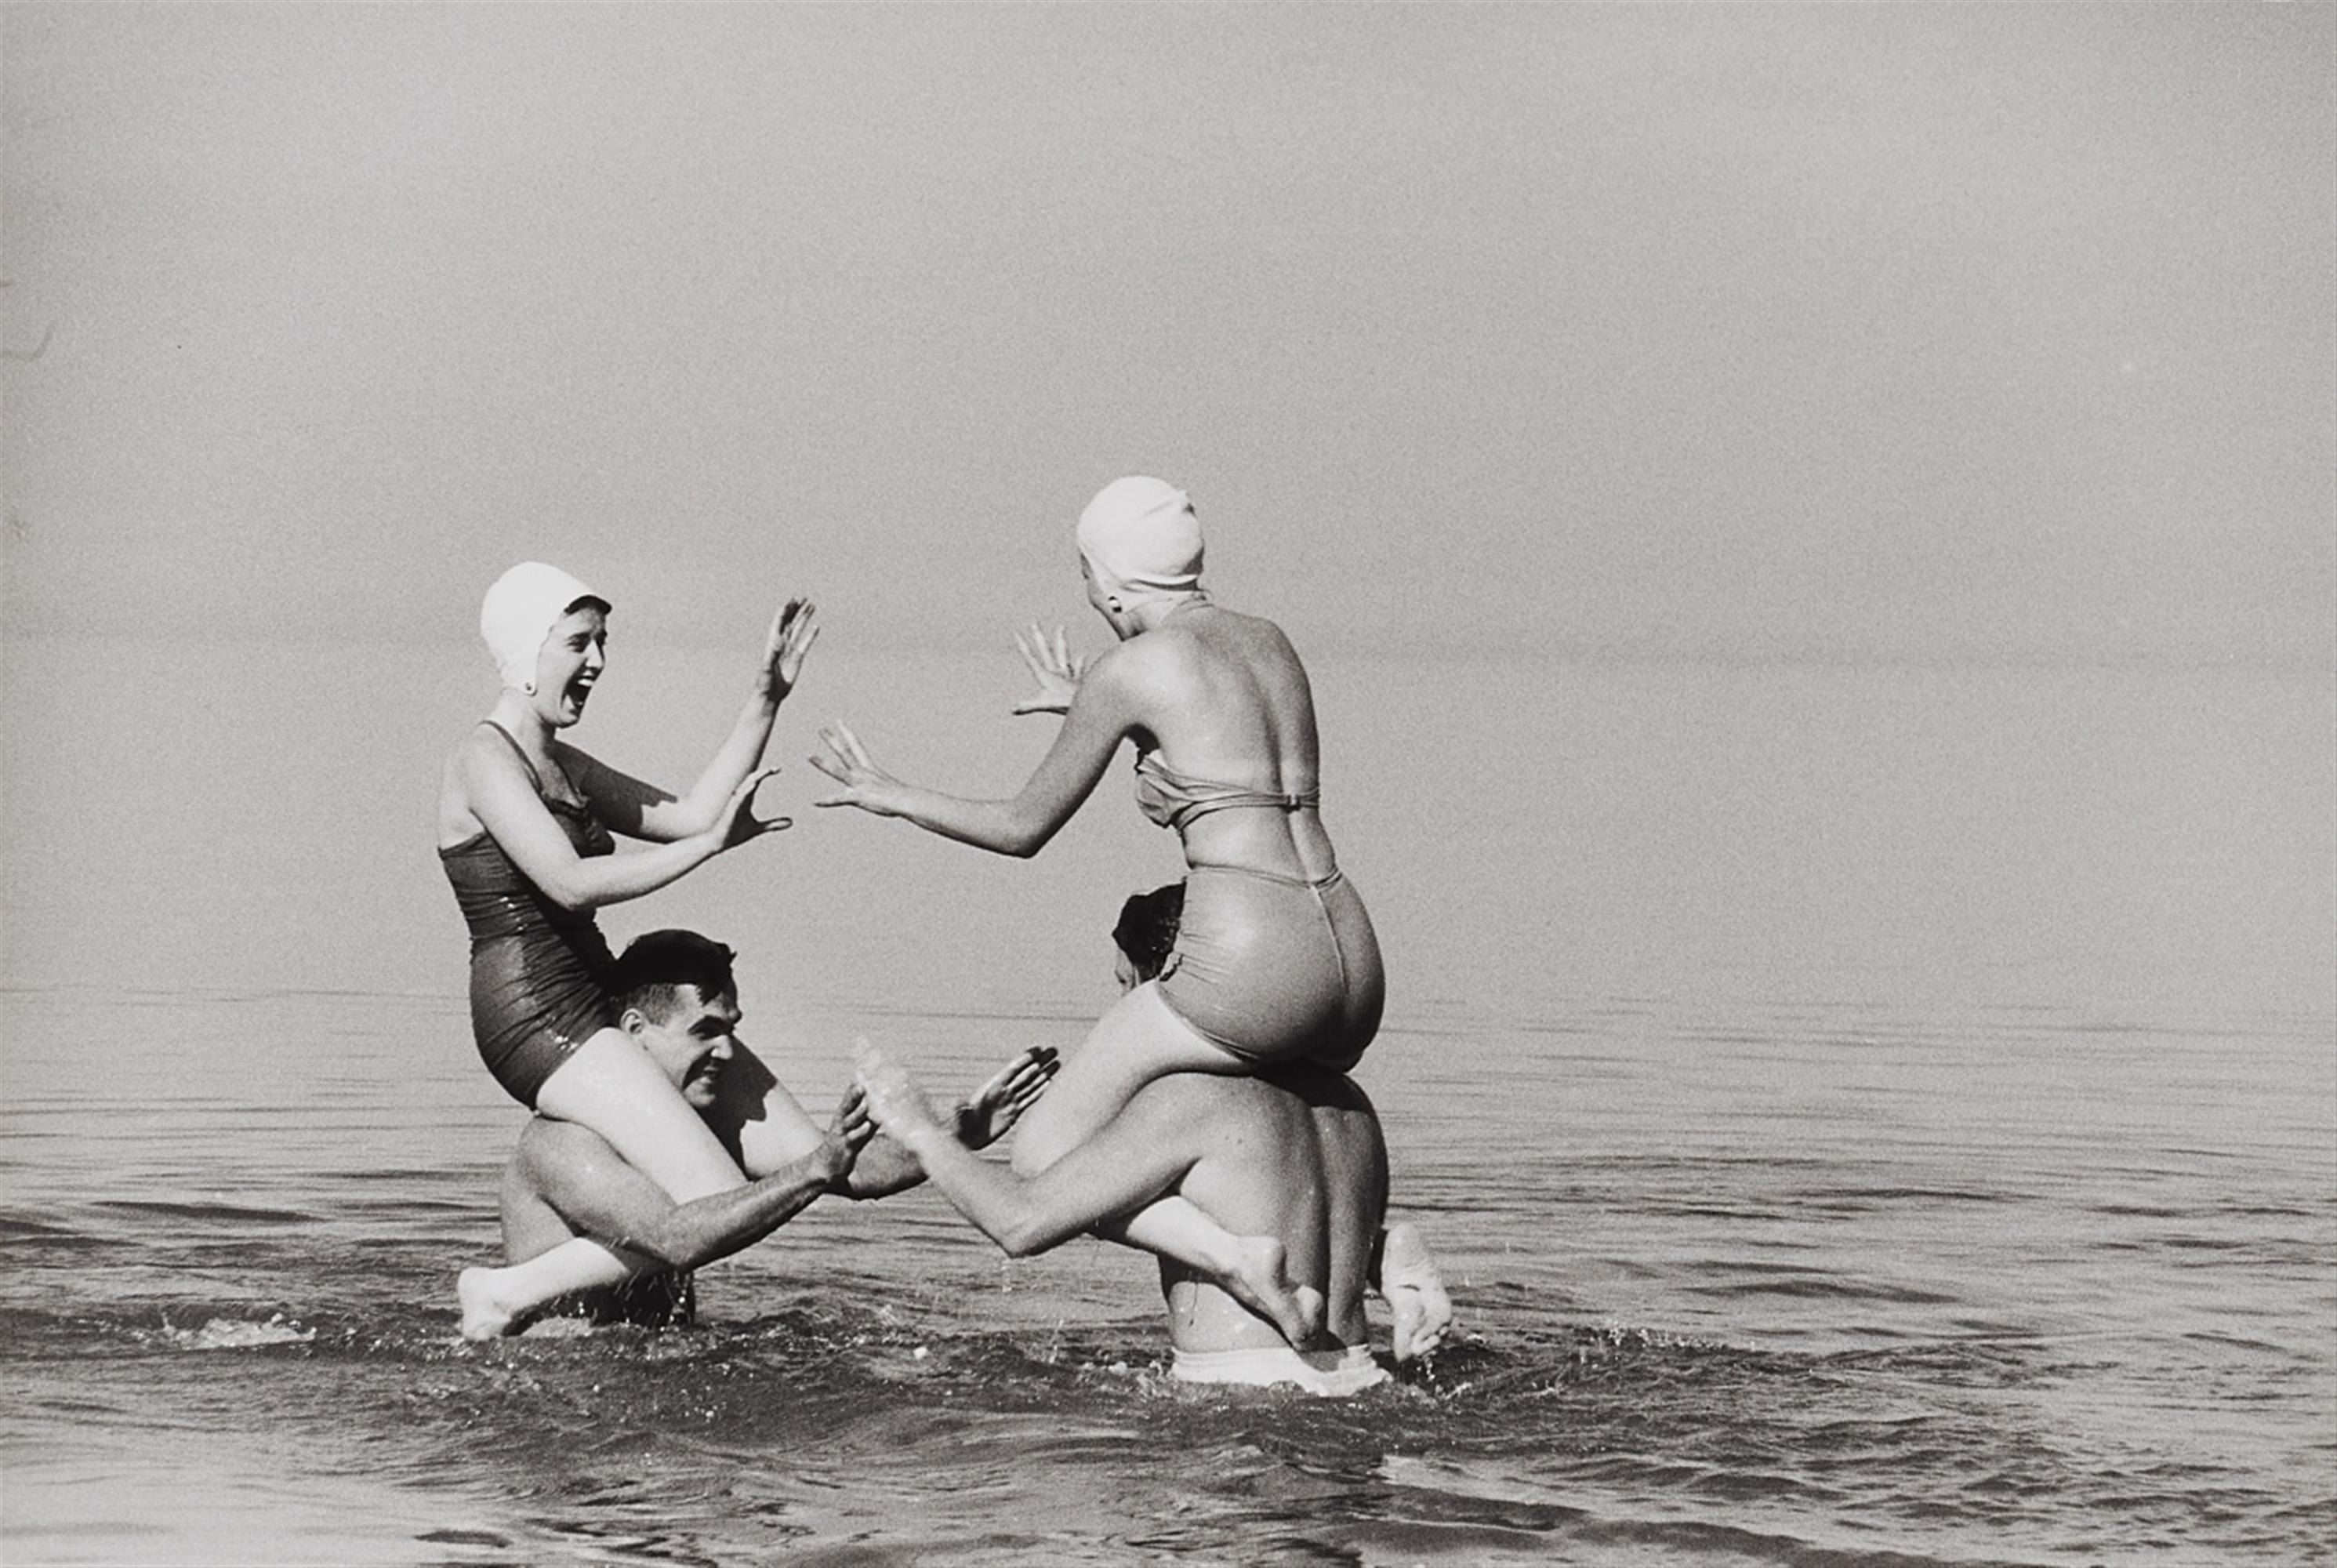 Ernst Haas, Swimmers, Long Island, New York (N)